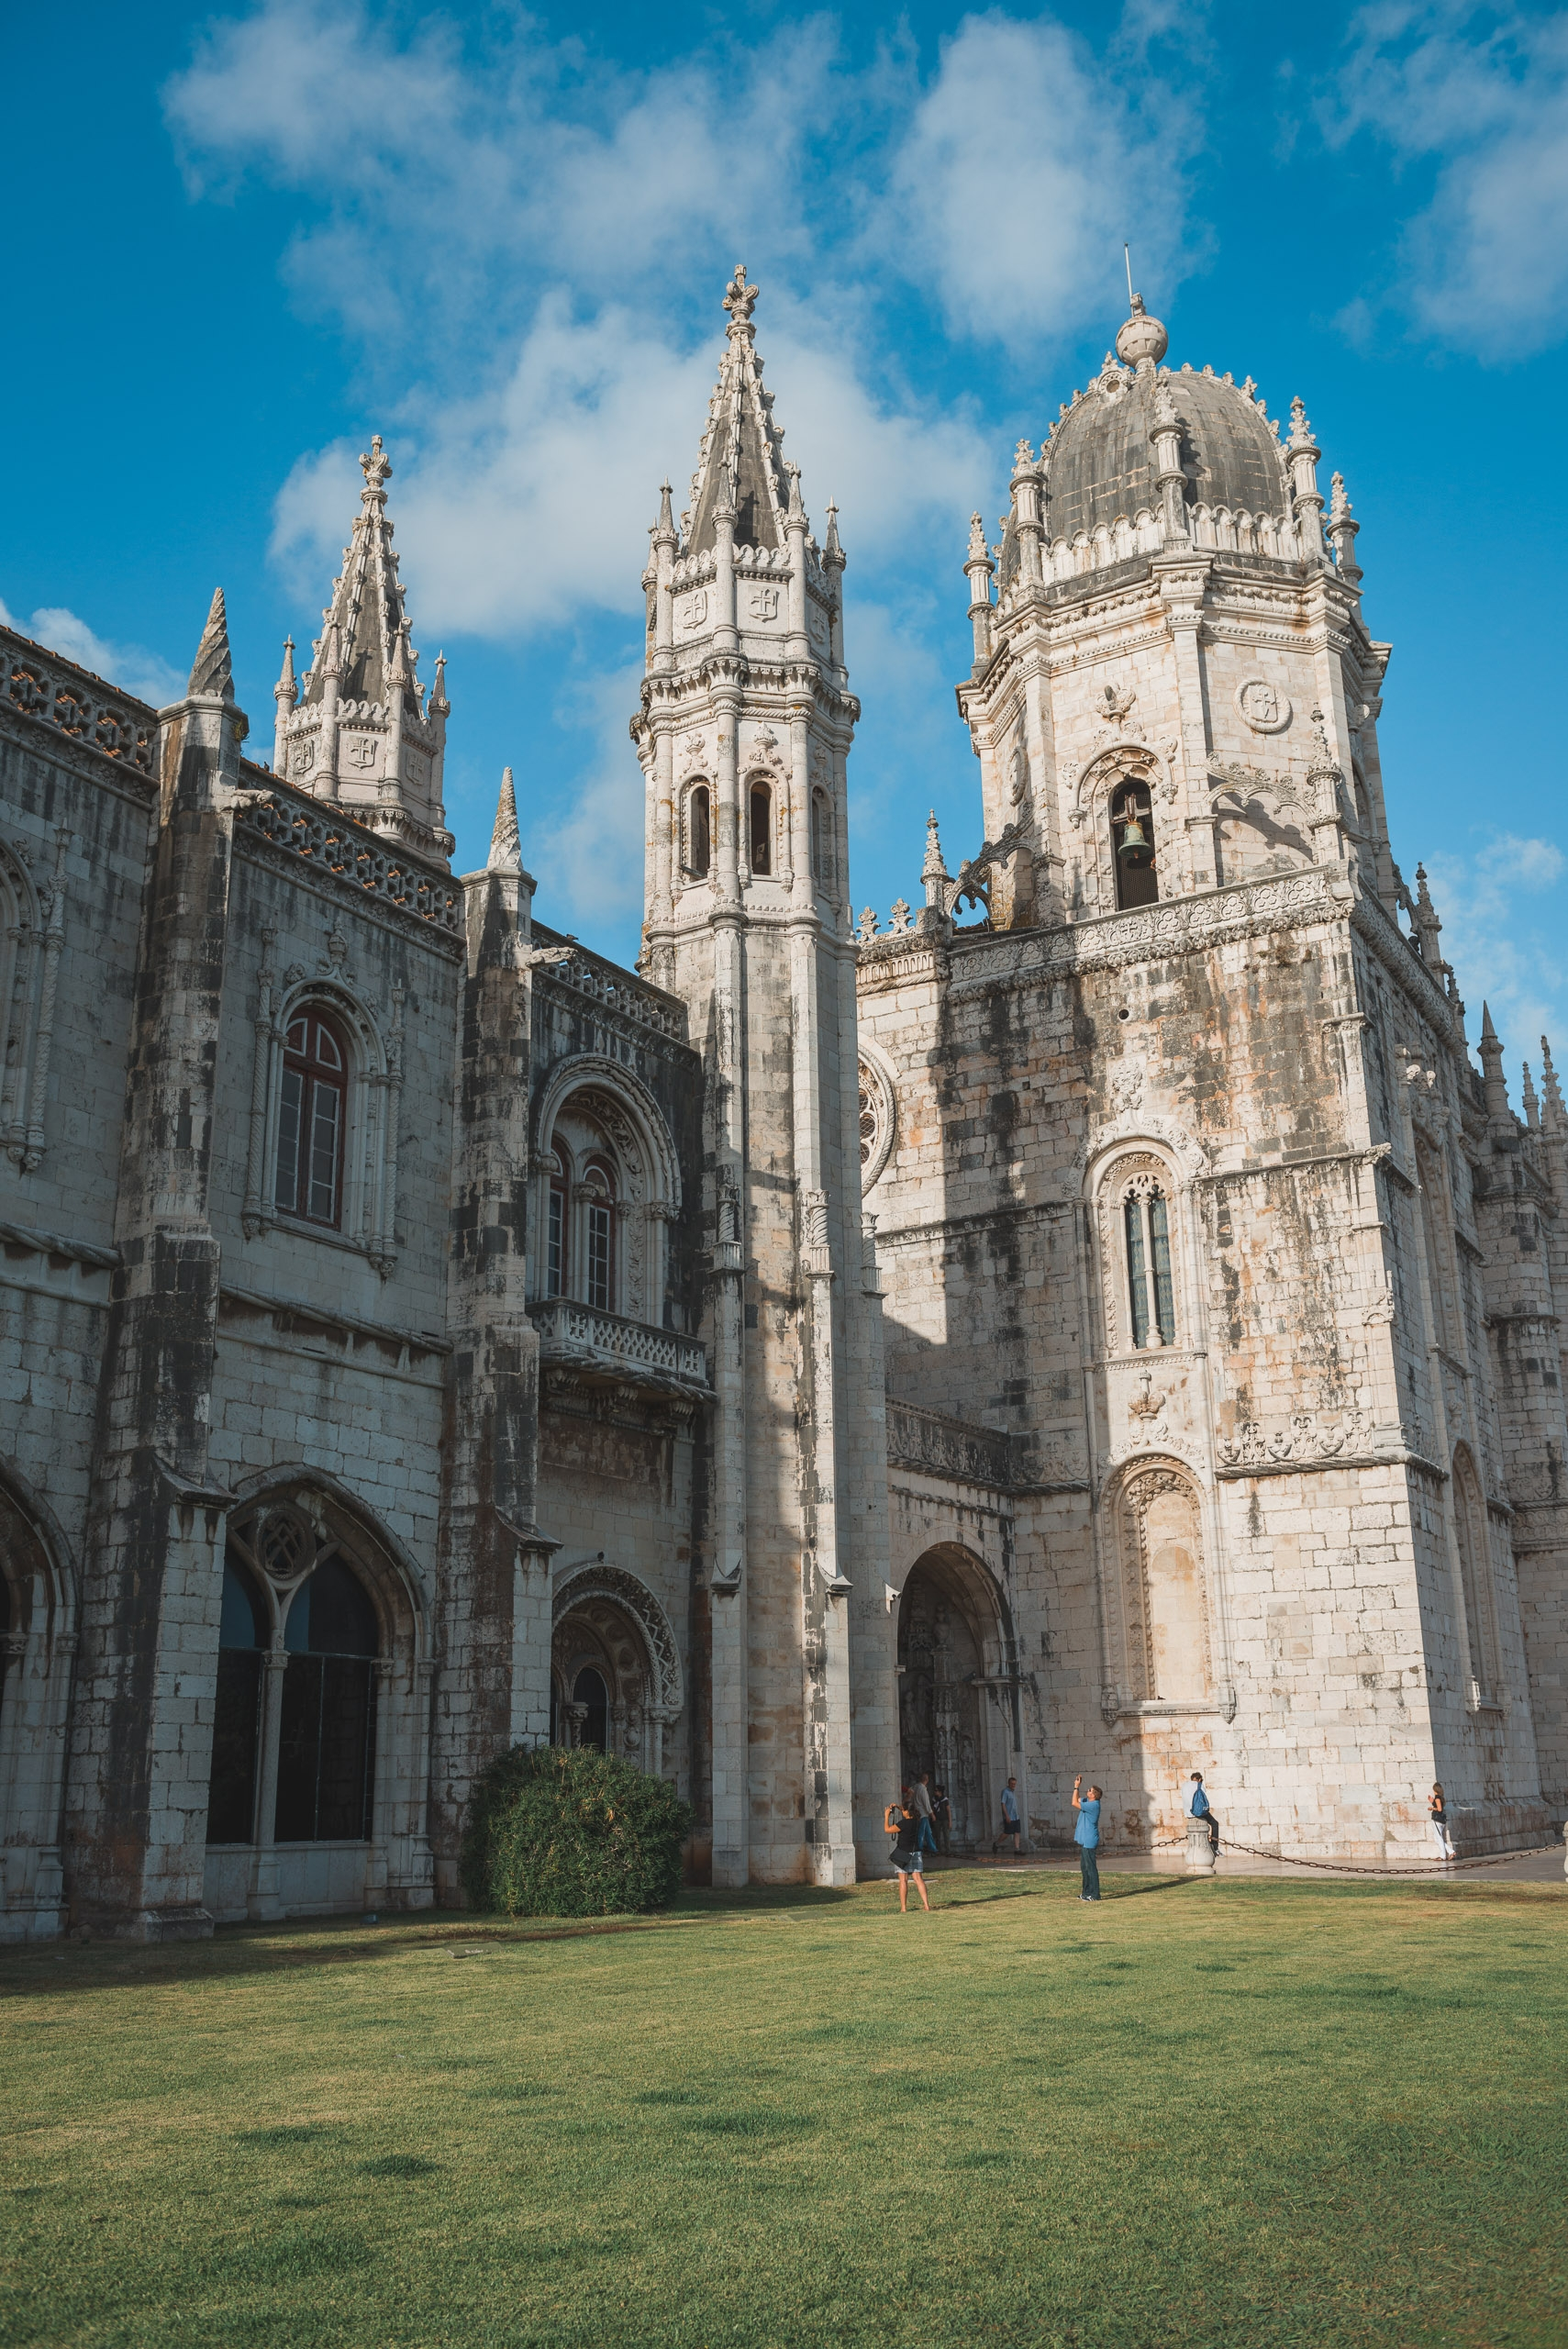 Portugal - Lisbon - 2012-0923-DSC_1590_18727